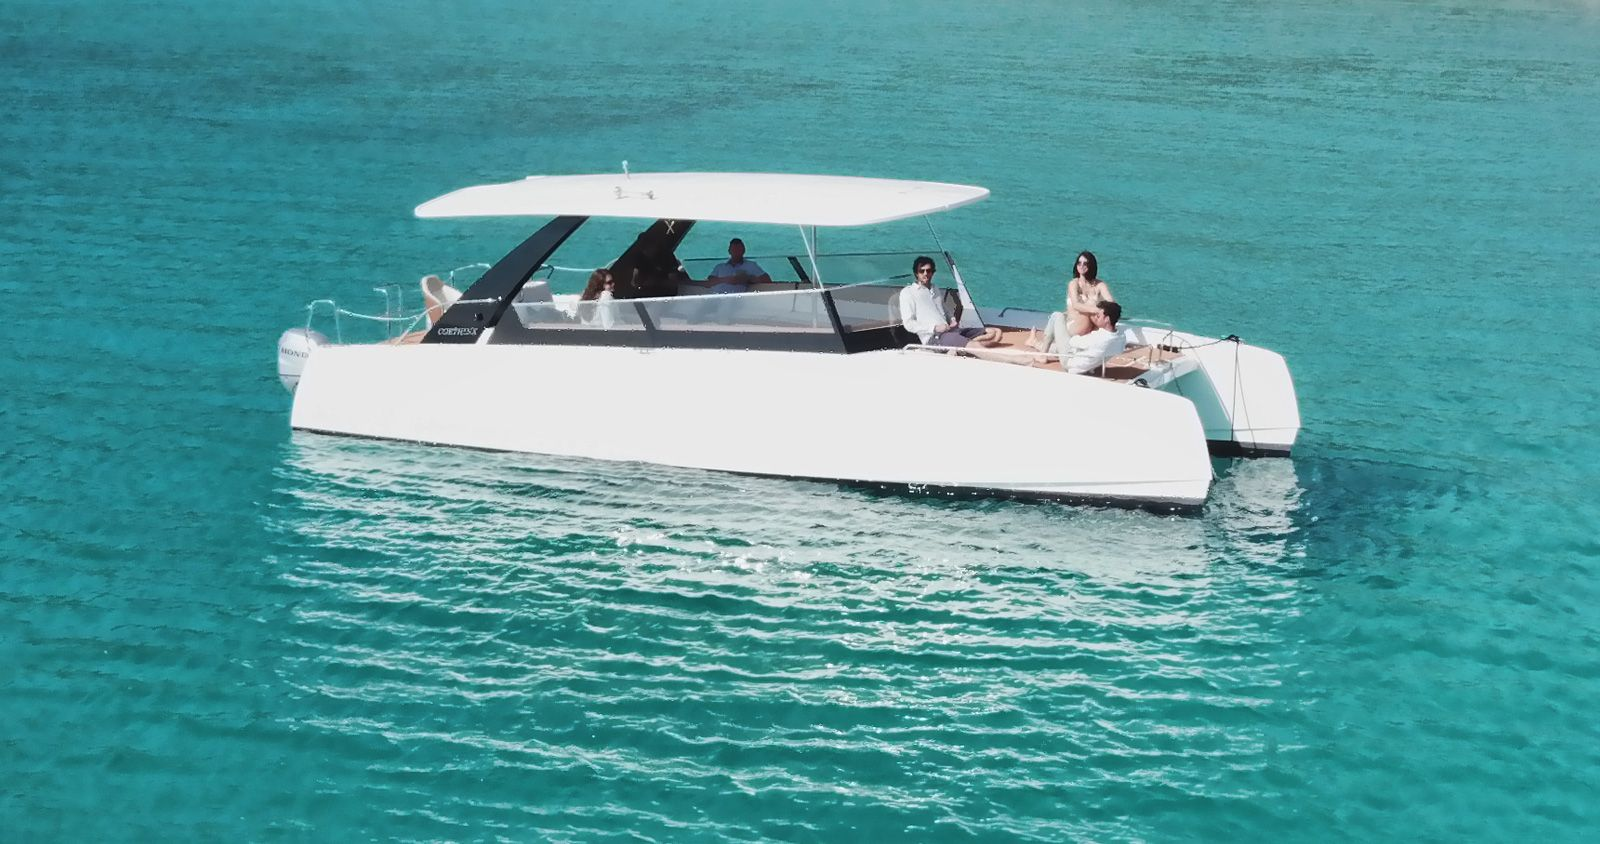 medium resolution of catamarans corthinx pontoon boat boat stuff boat plans catamaran product design